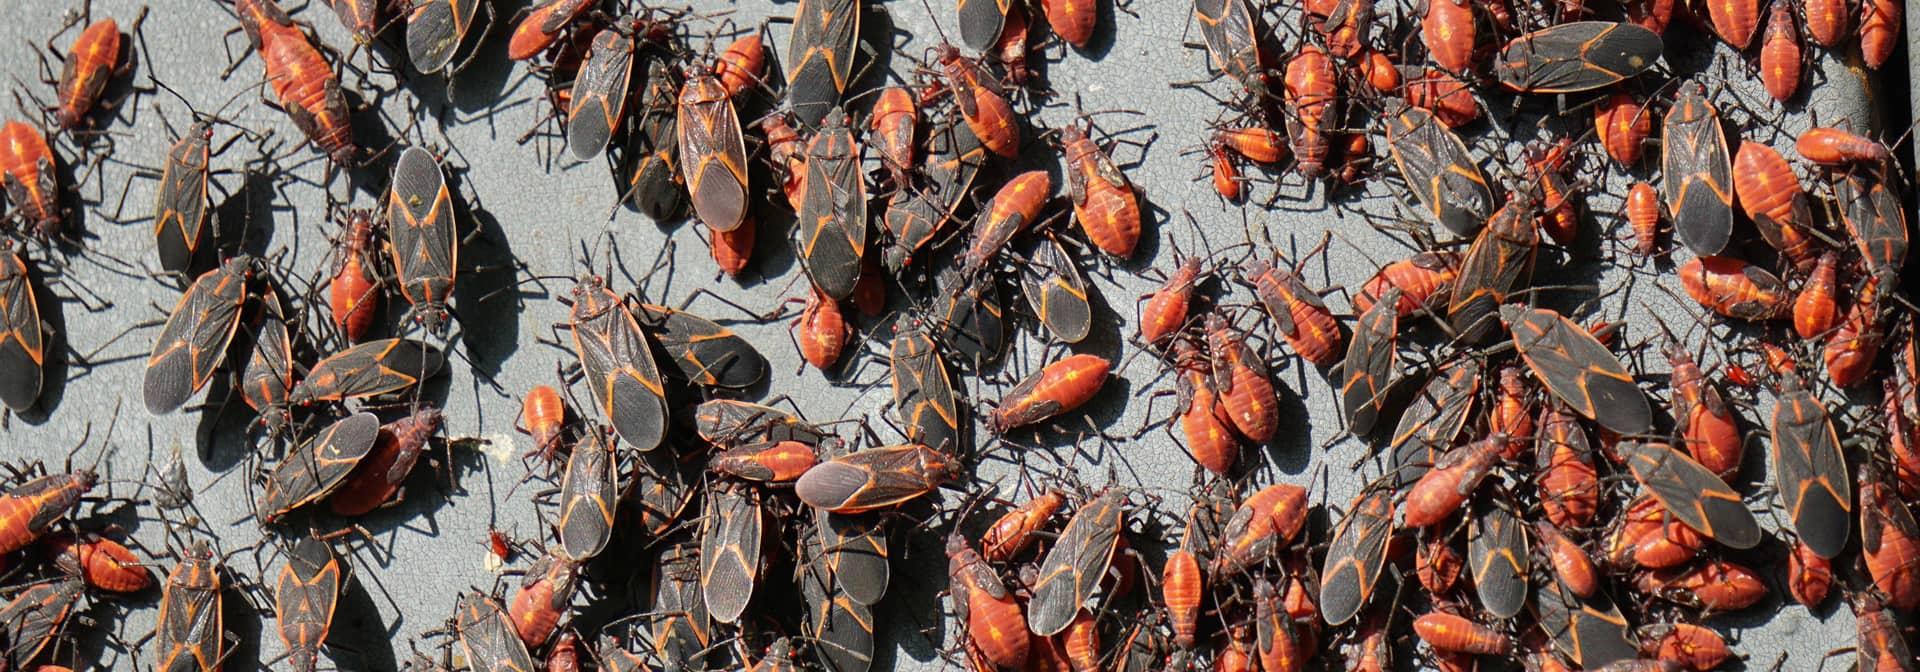 Box Elder Bug Control Charlotte NC